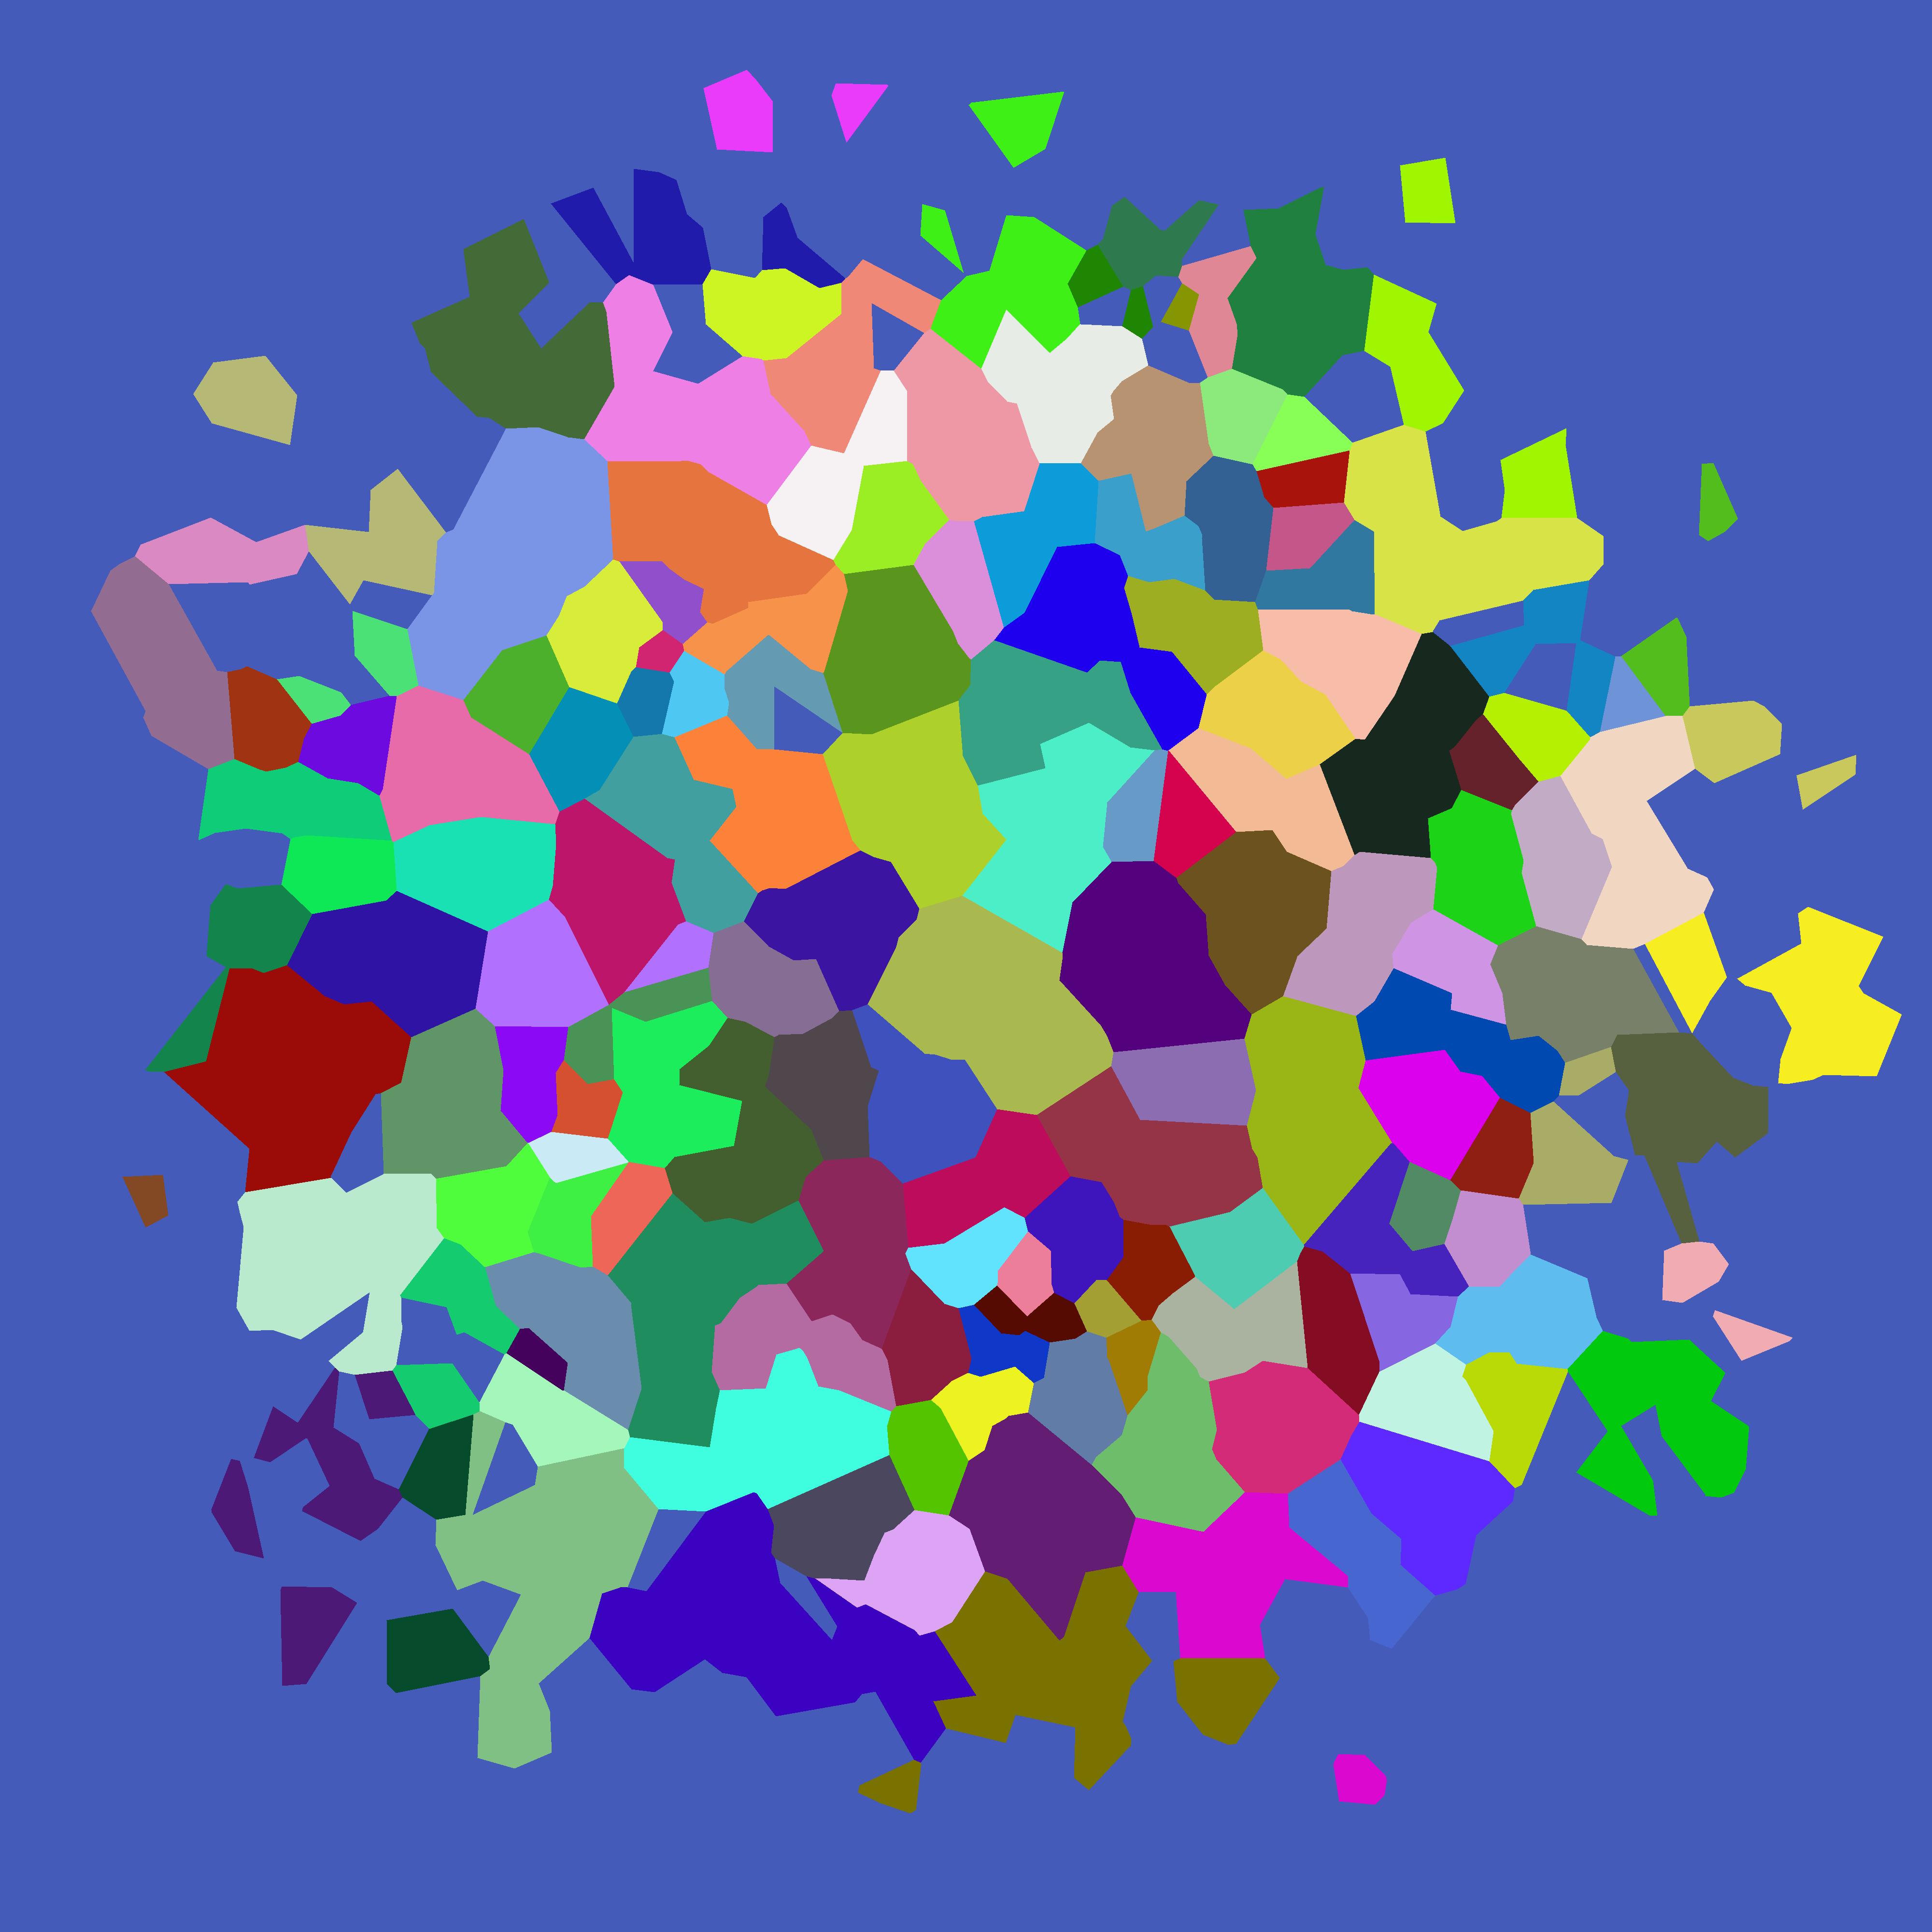 Procedural Map Generation for Crusader Kings II, Part 3: Dividing